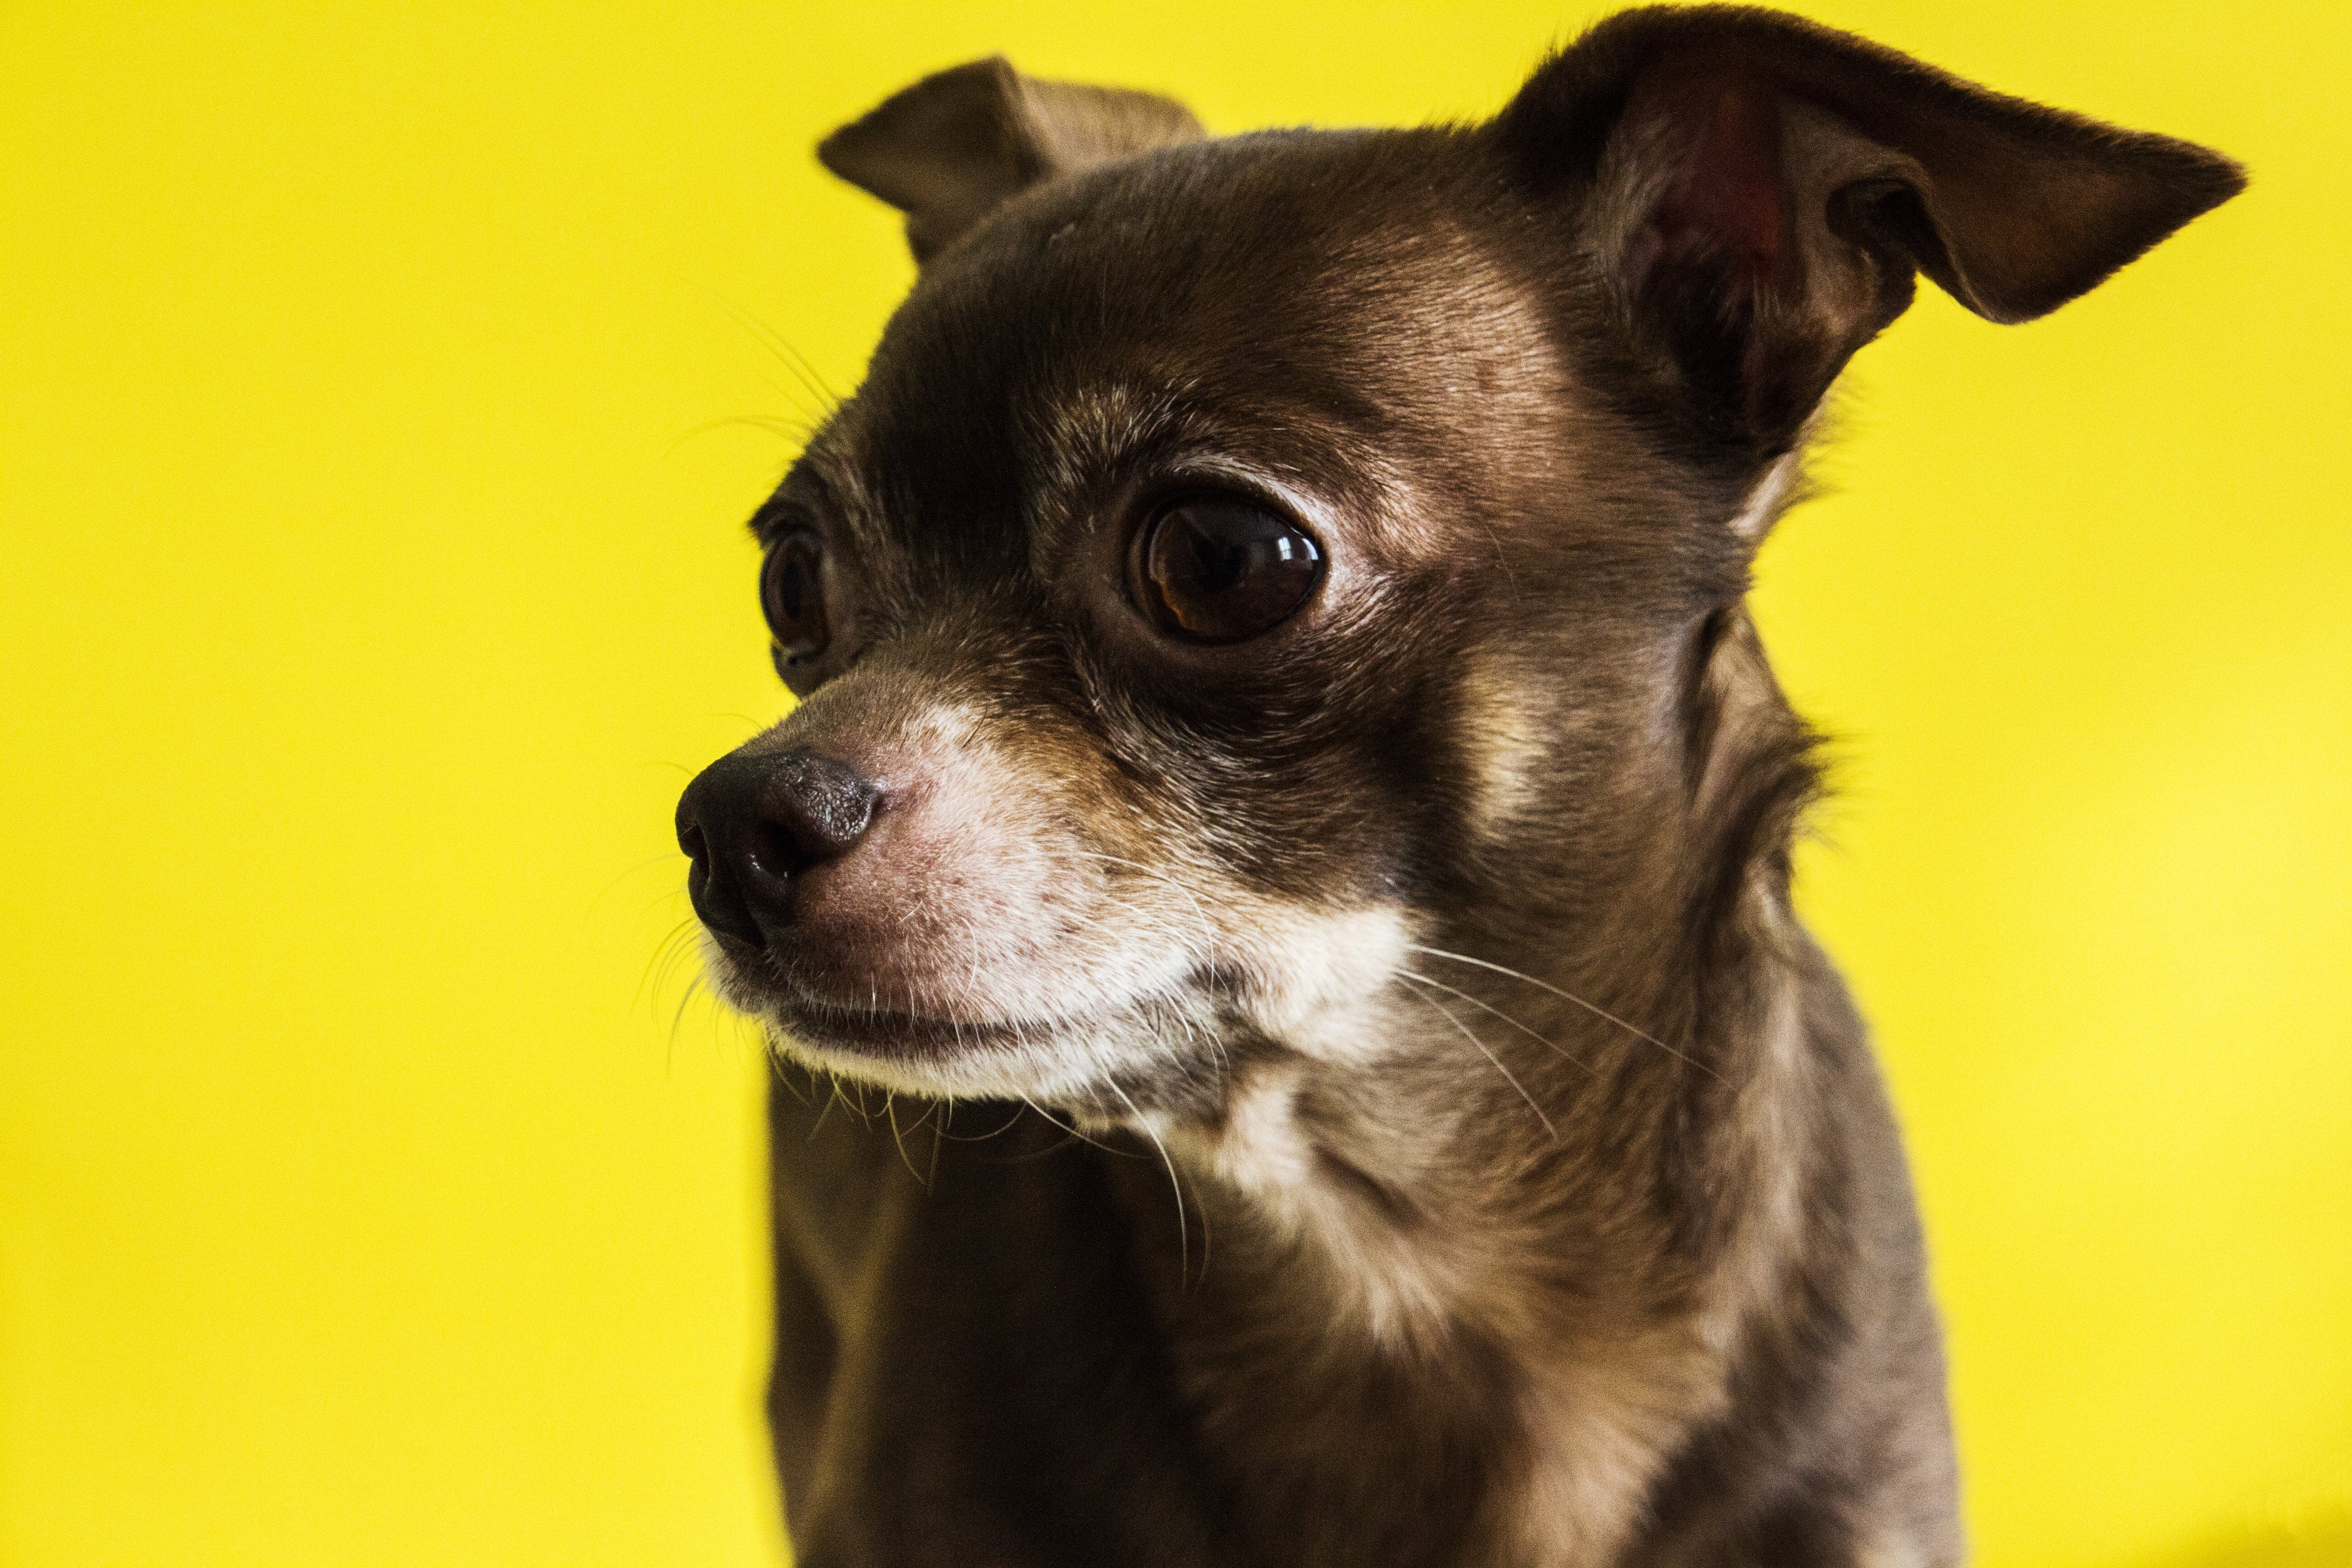 Gratis lagerfoto af chihuahua, dyr, hund, husdyr